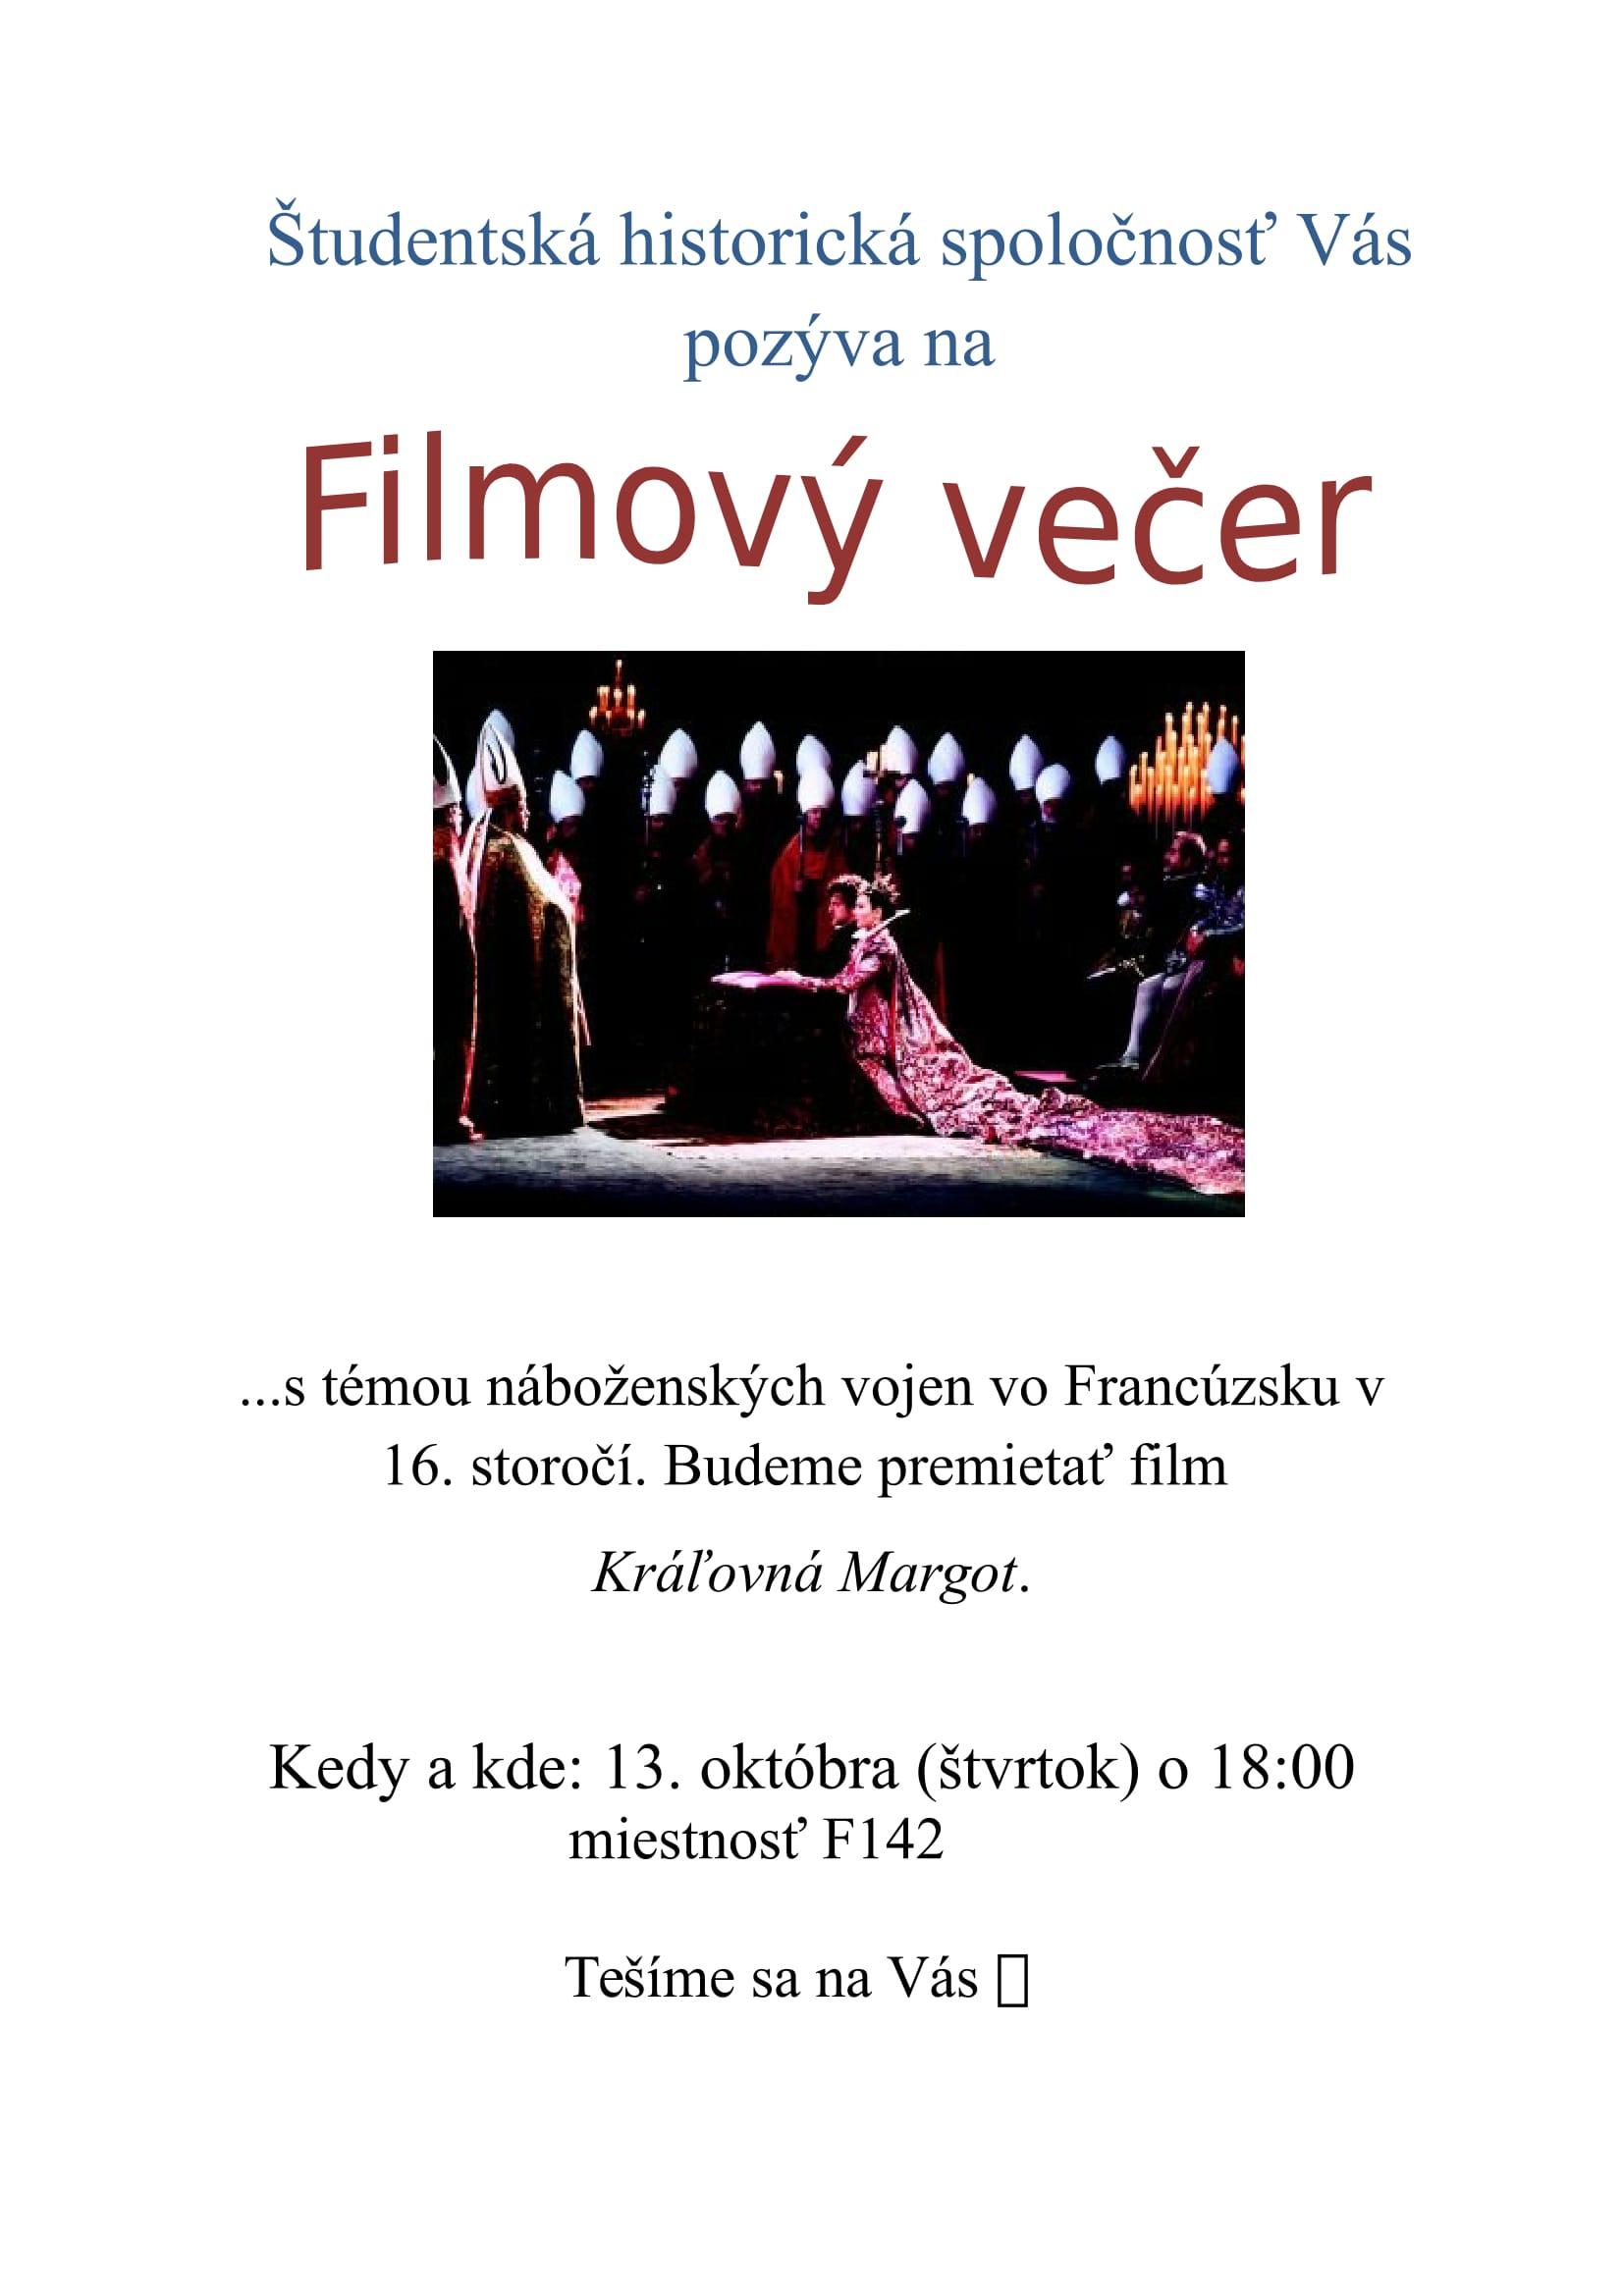 Filmový večer - pozvánka